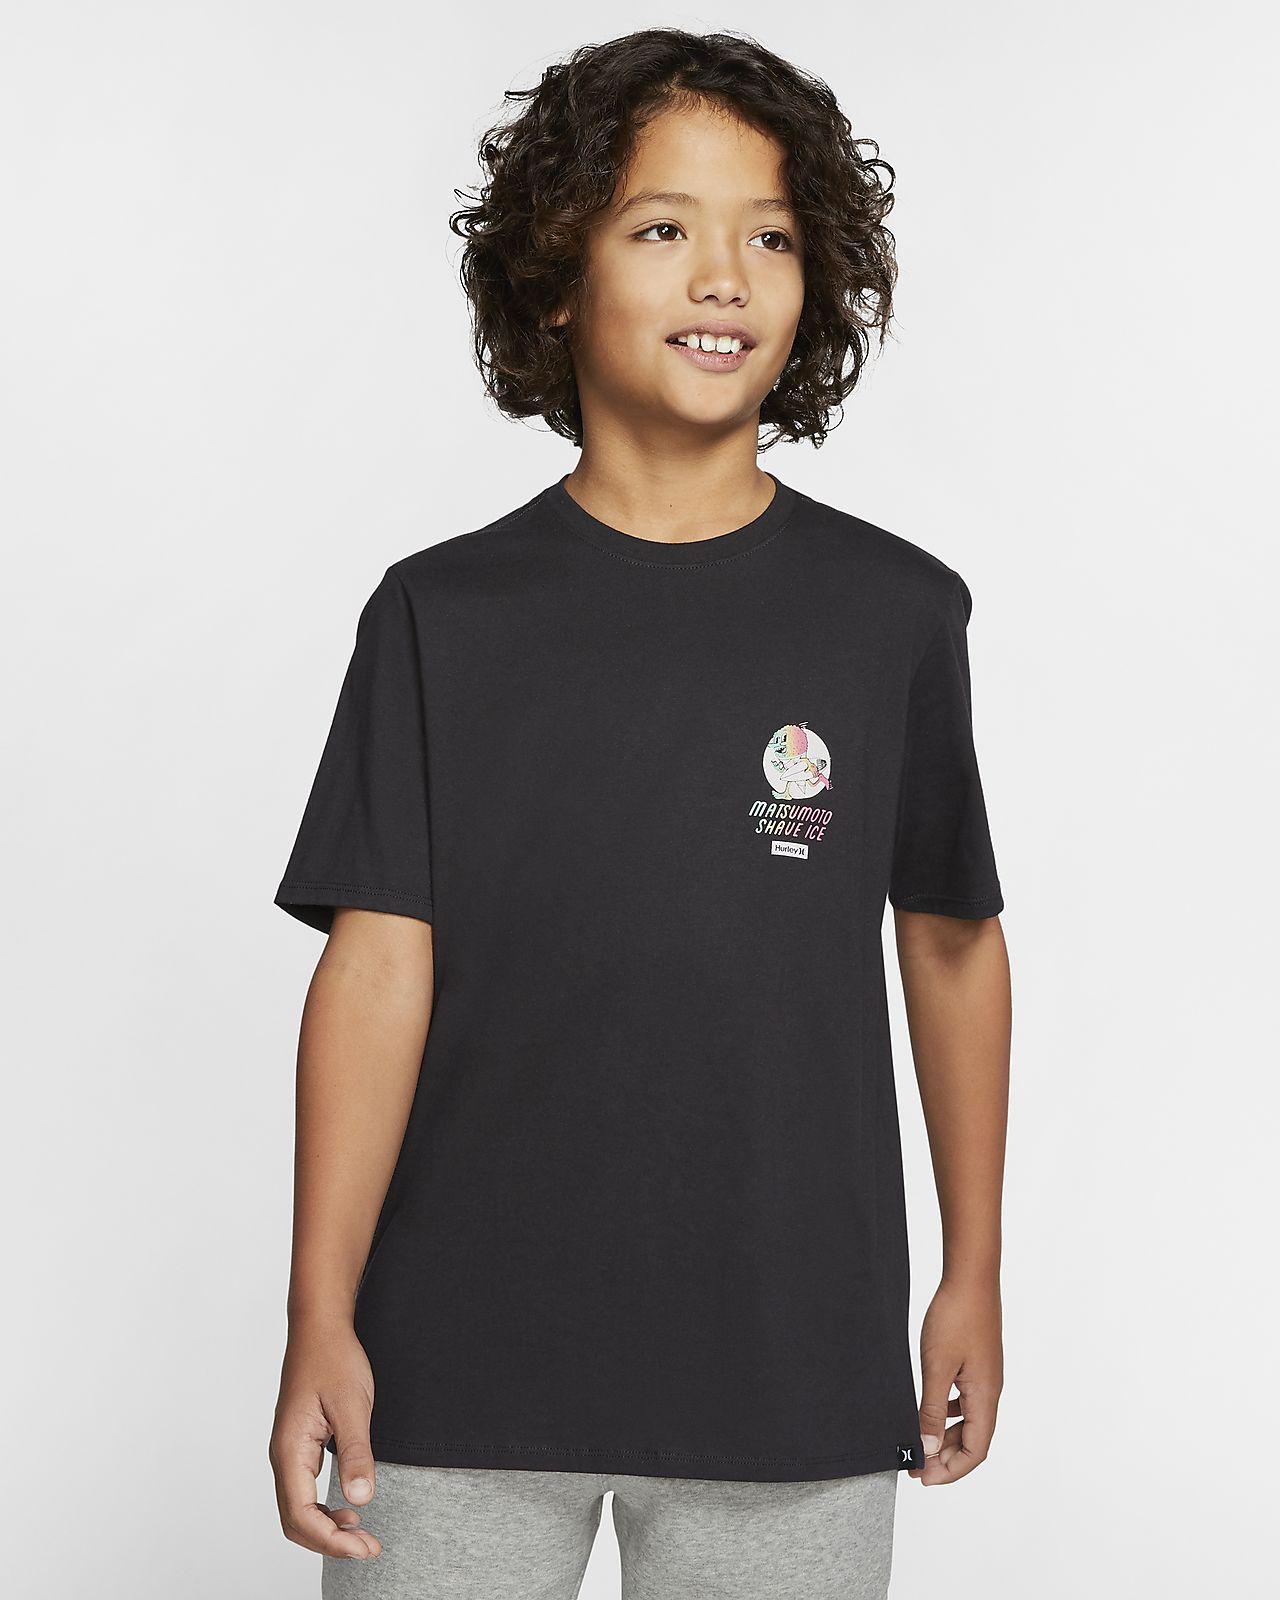 Hurley Premium x Matsumoto Shave Ice Boys' T-Shirt